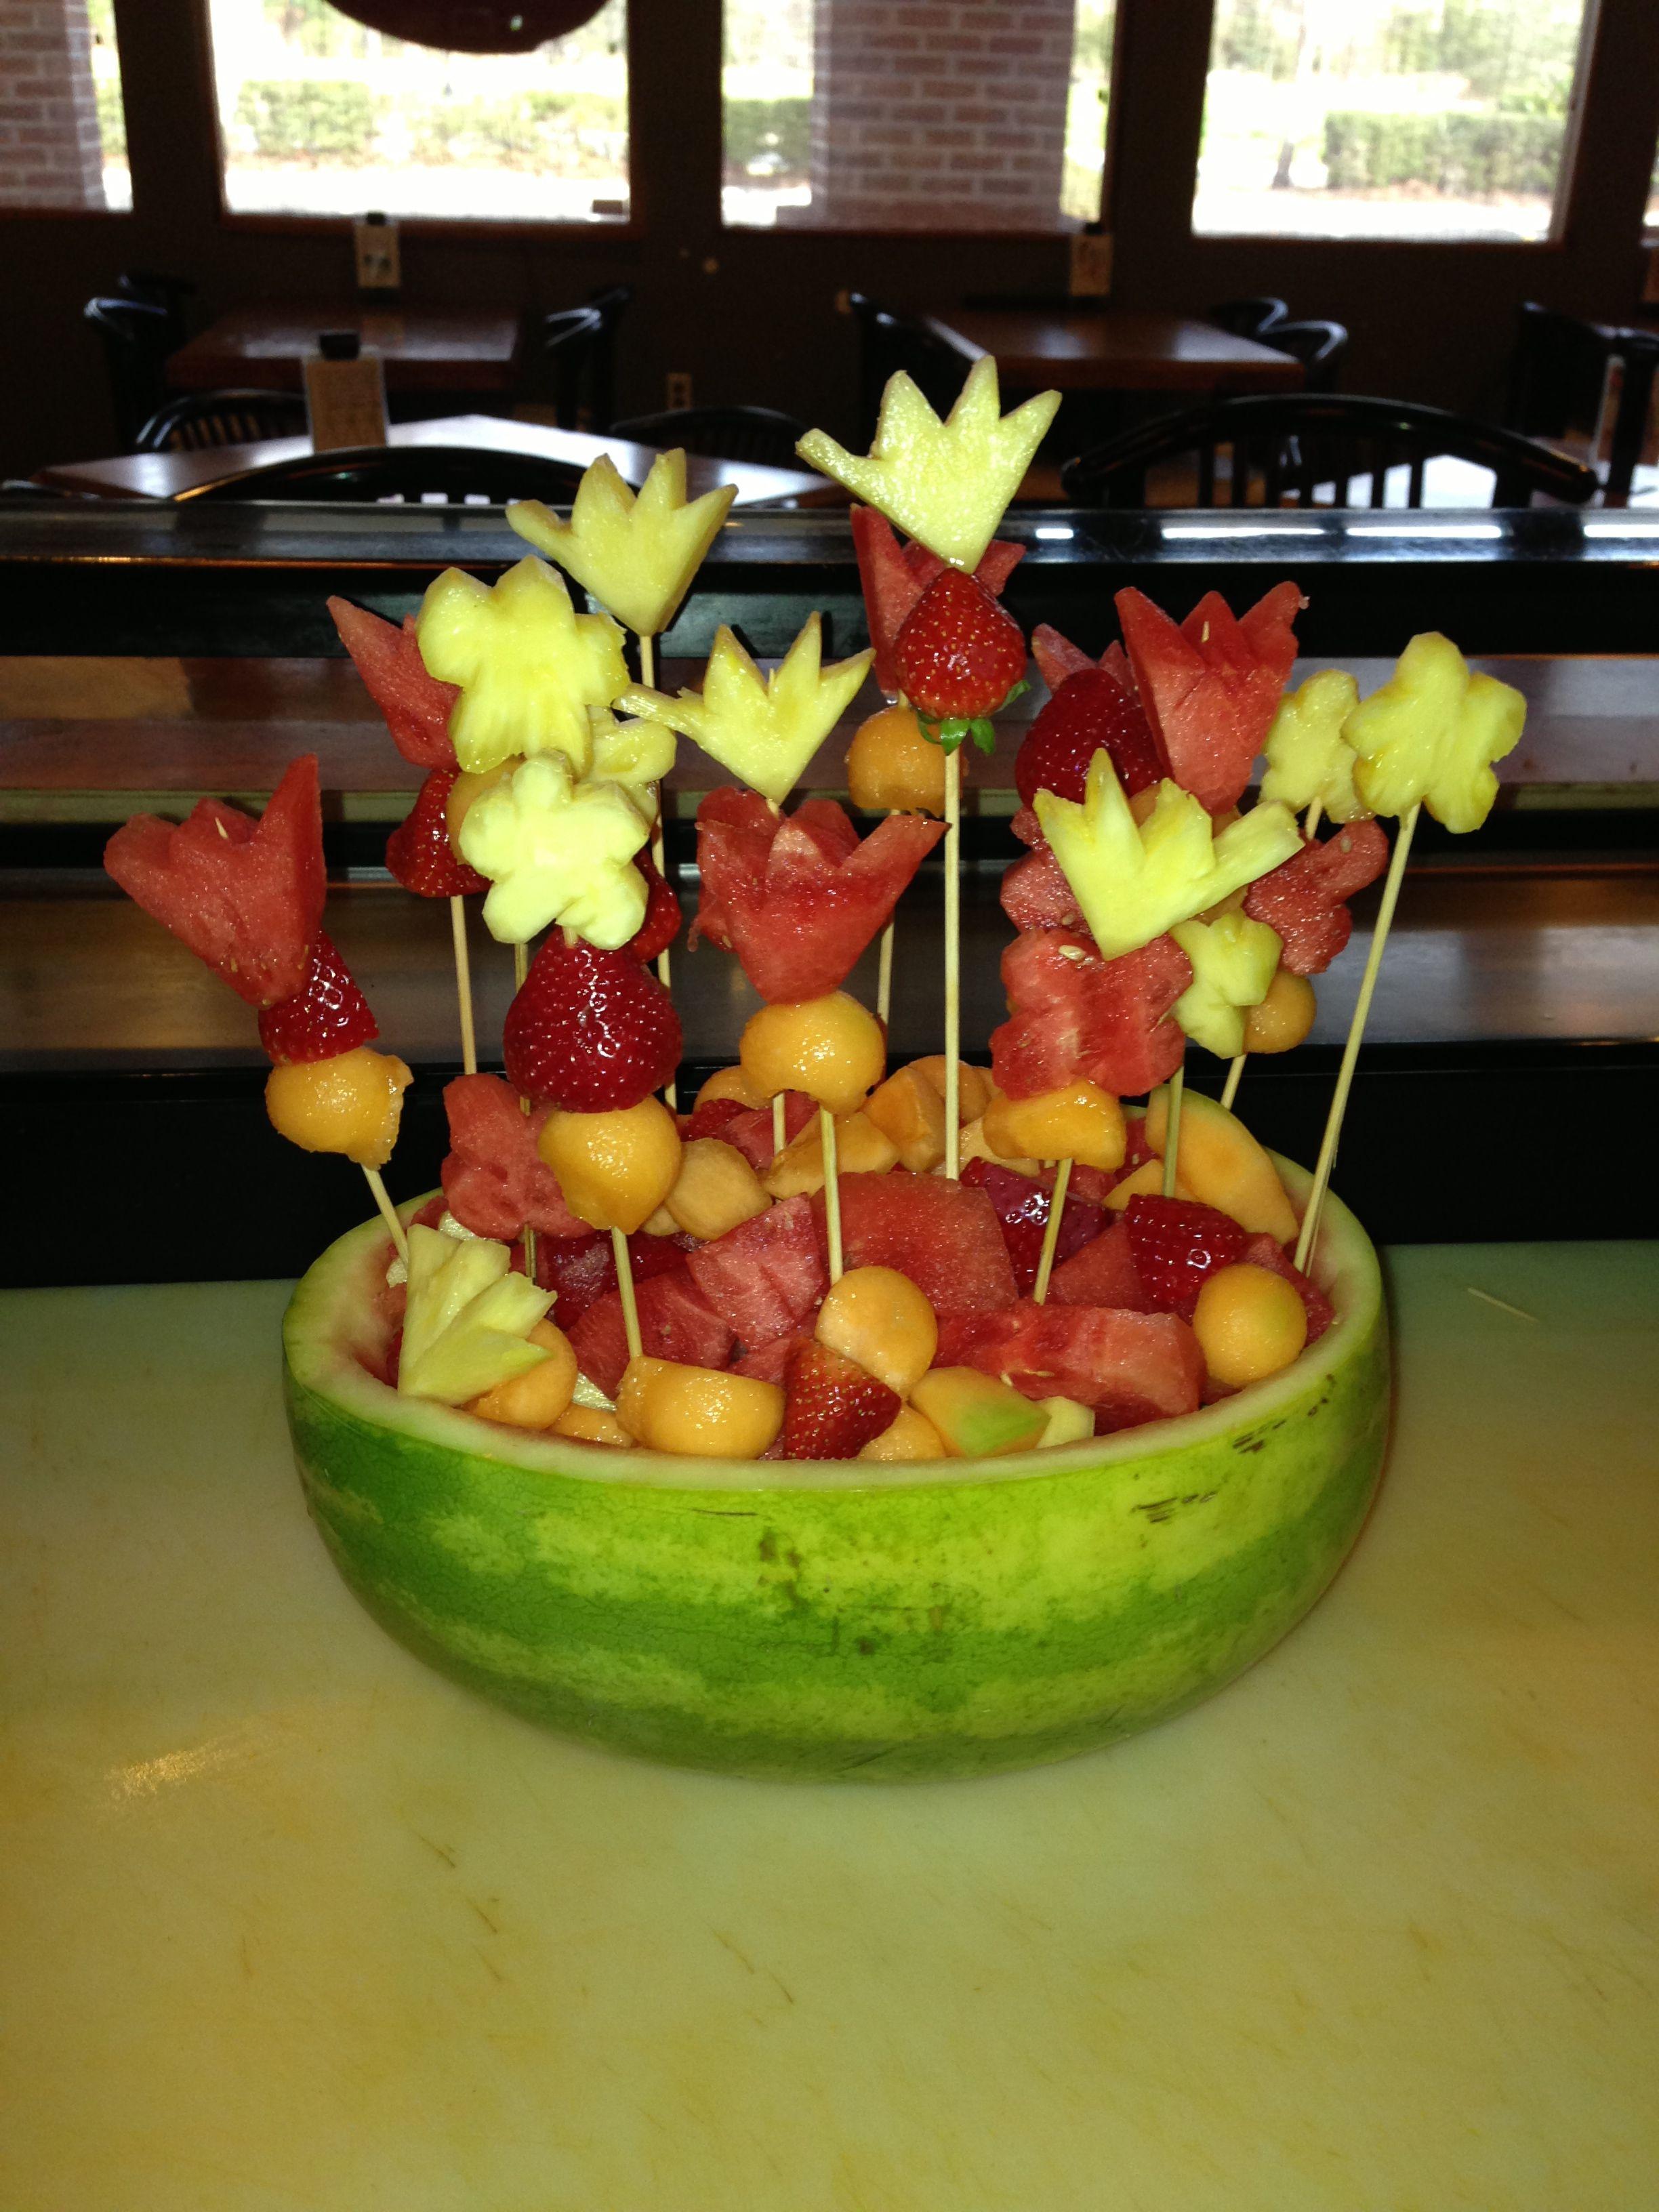 Fruit carving ideas food art pinterest